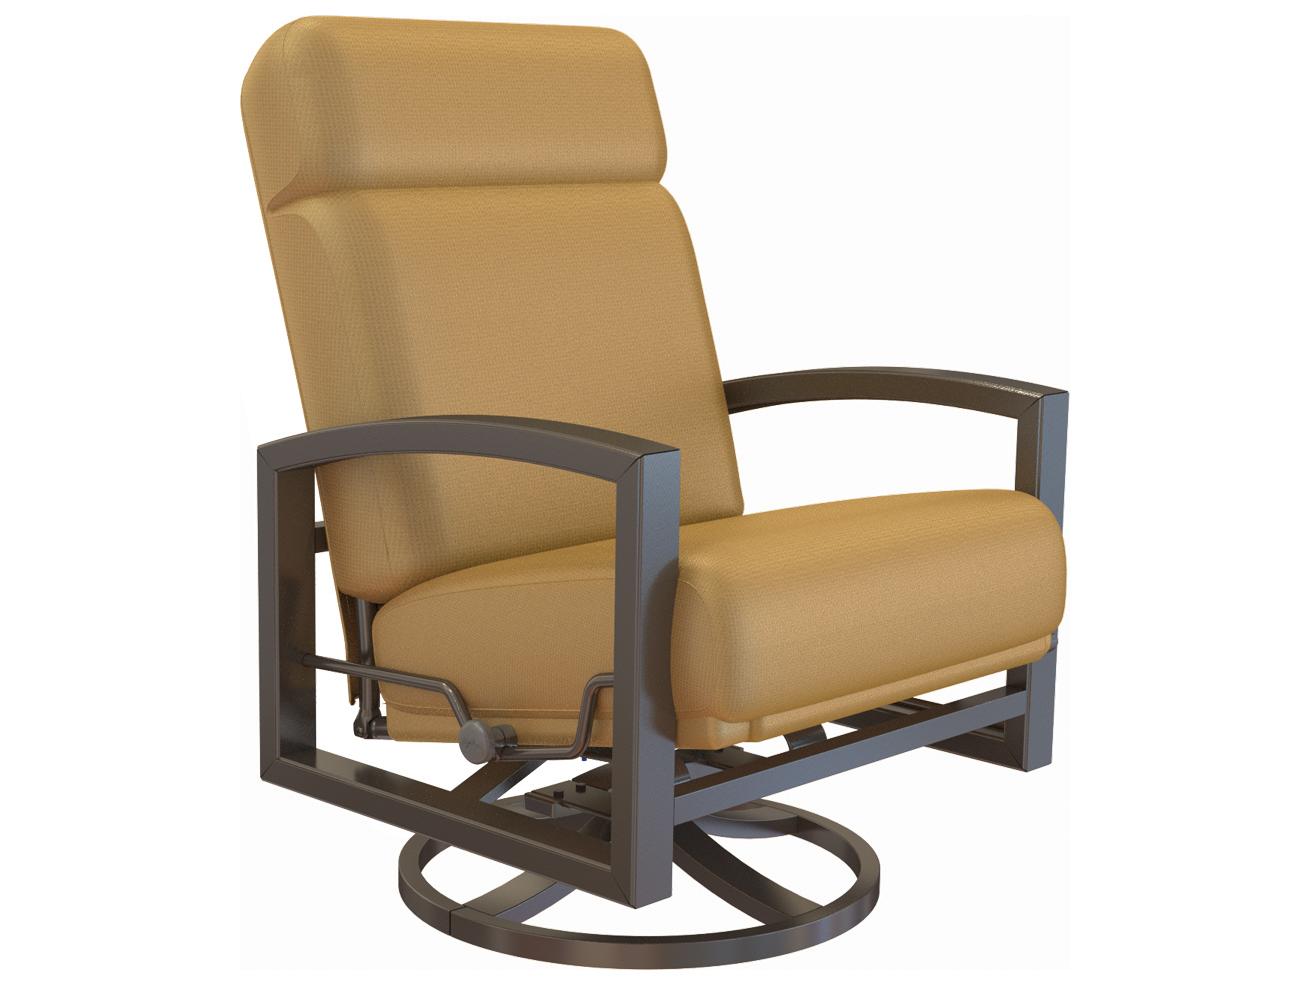 Tropitone Lakeside Urcomfort™ Cushion Aluminum Swivel Action Lounger ...